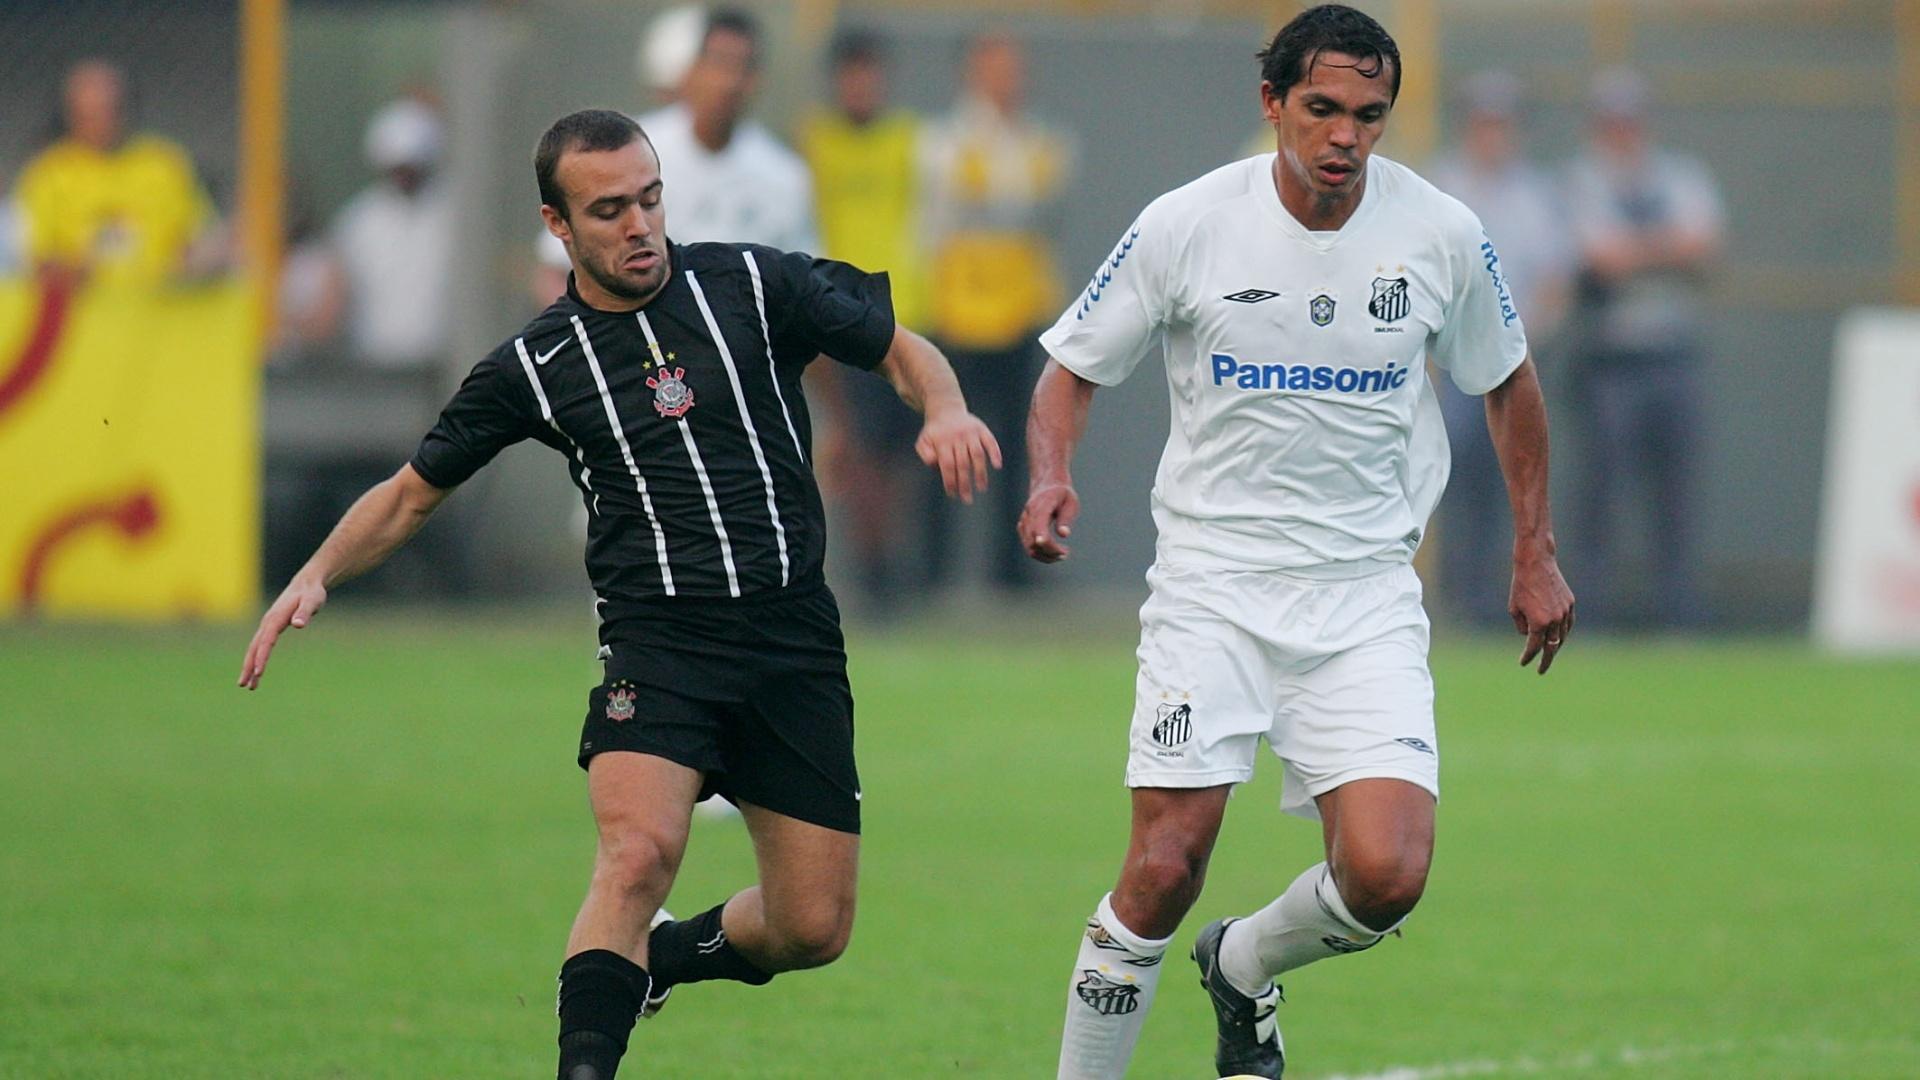 Santista Giovanni é marcado pelo corintiano Roger durante clássico paulista (31/07/2005)